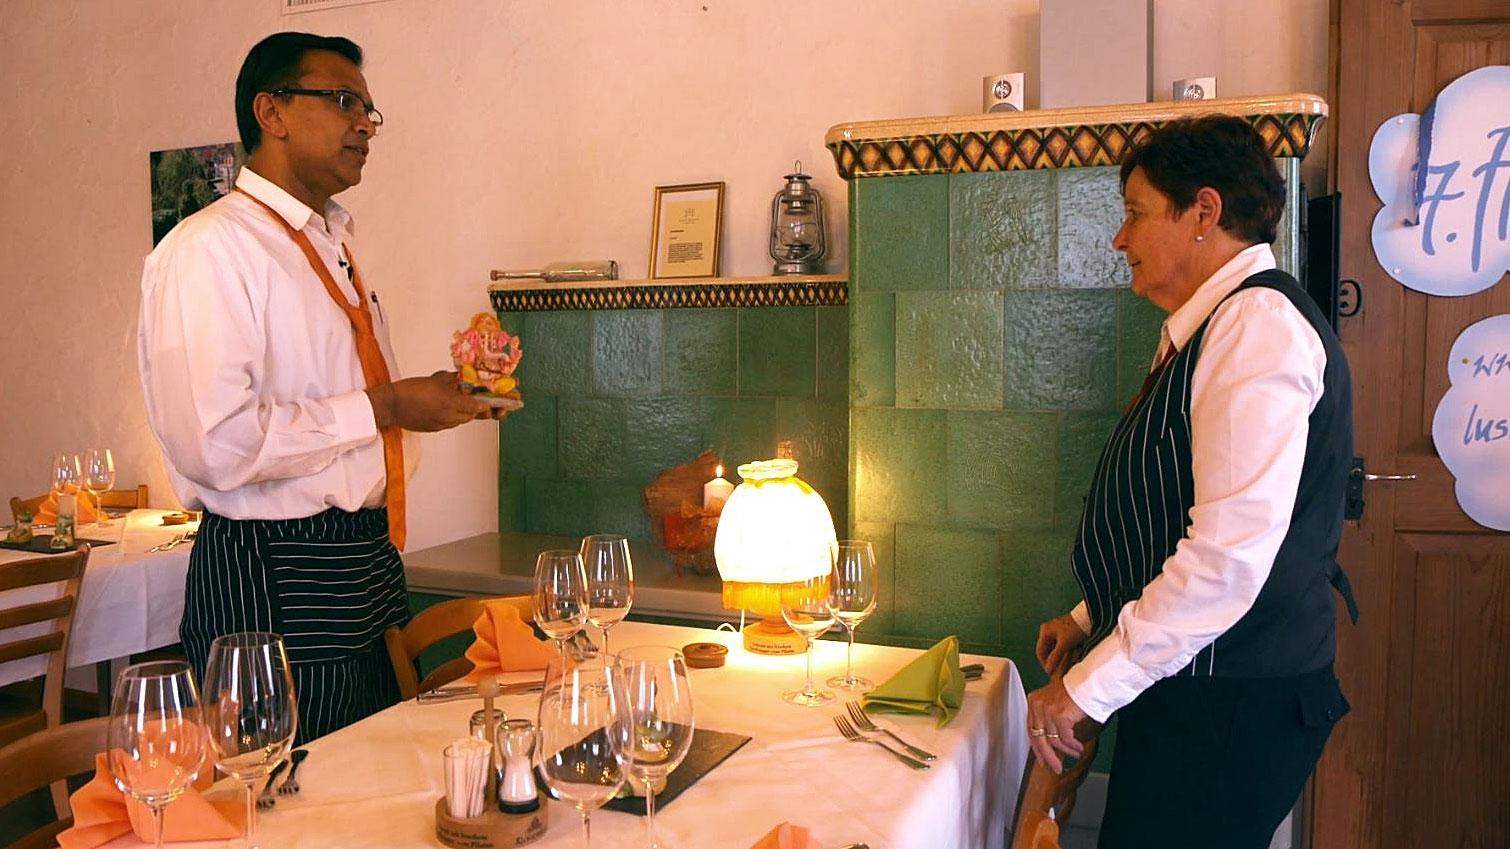 Blickwechsel: Curry statt Cordon bleu (Folge 2)